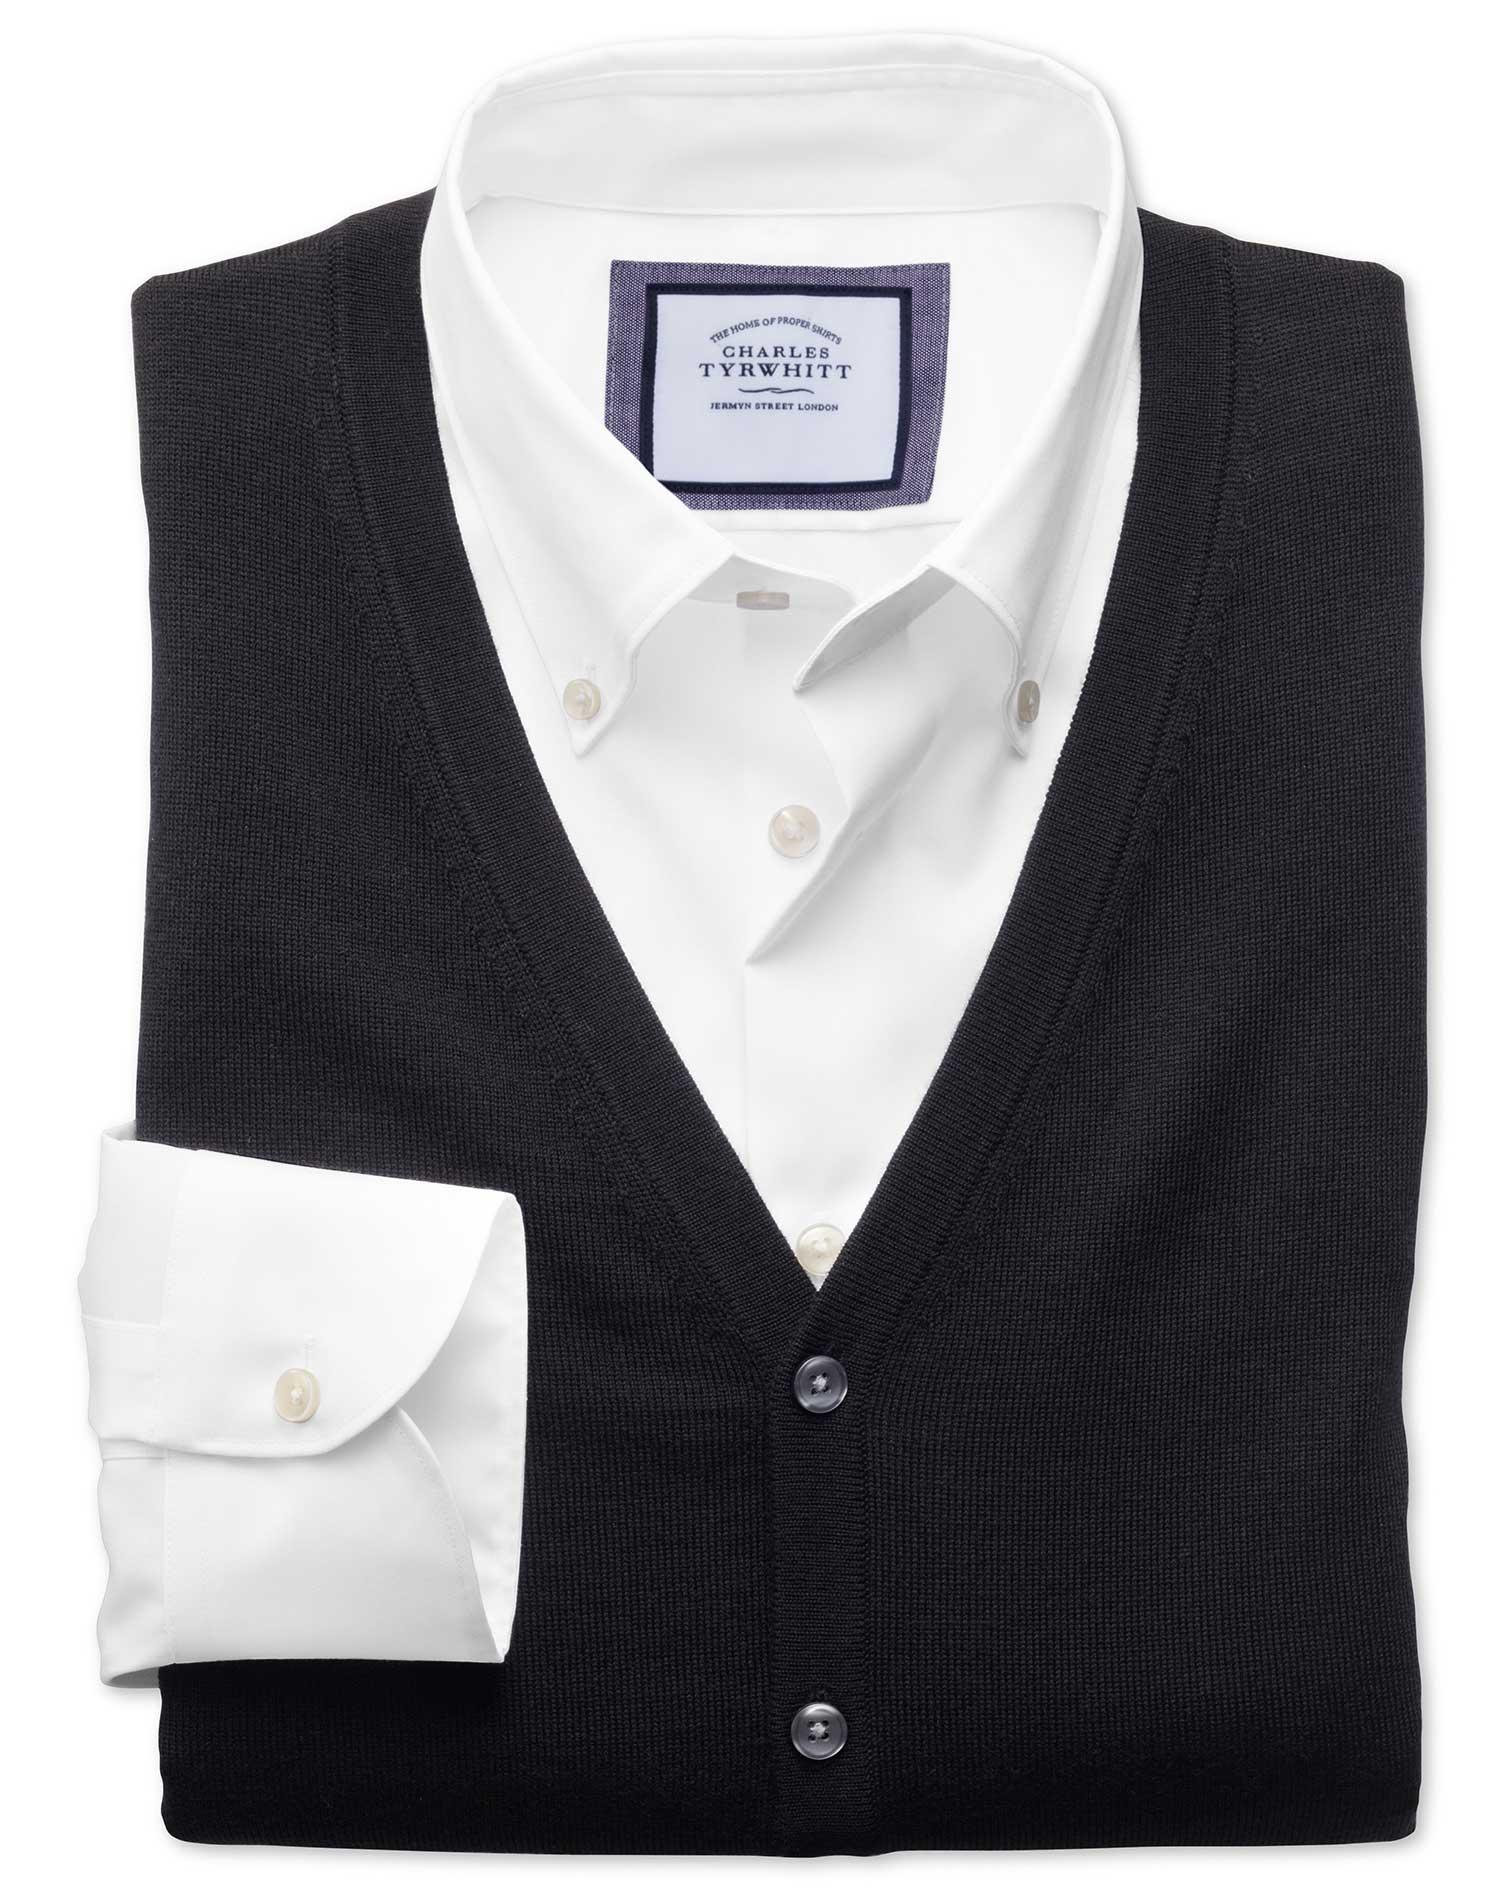 Black Merino Wool Waistcoat Size XXXL by Charles Tyrwhitt